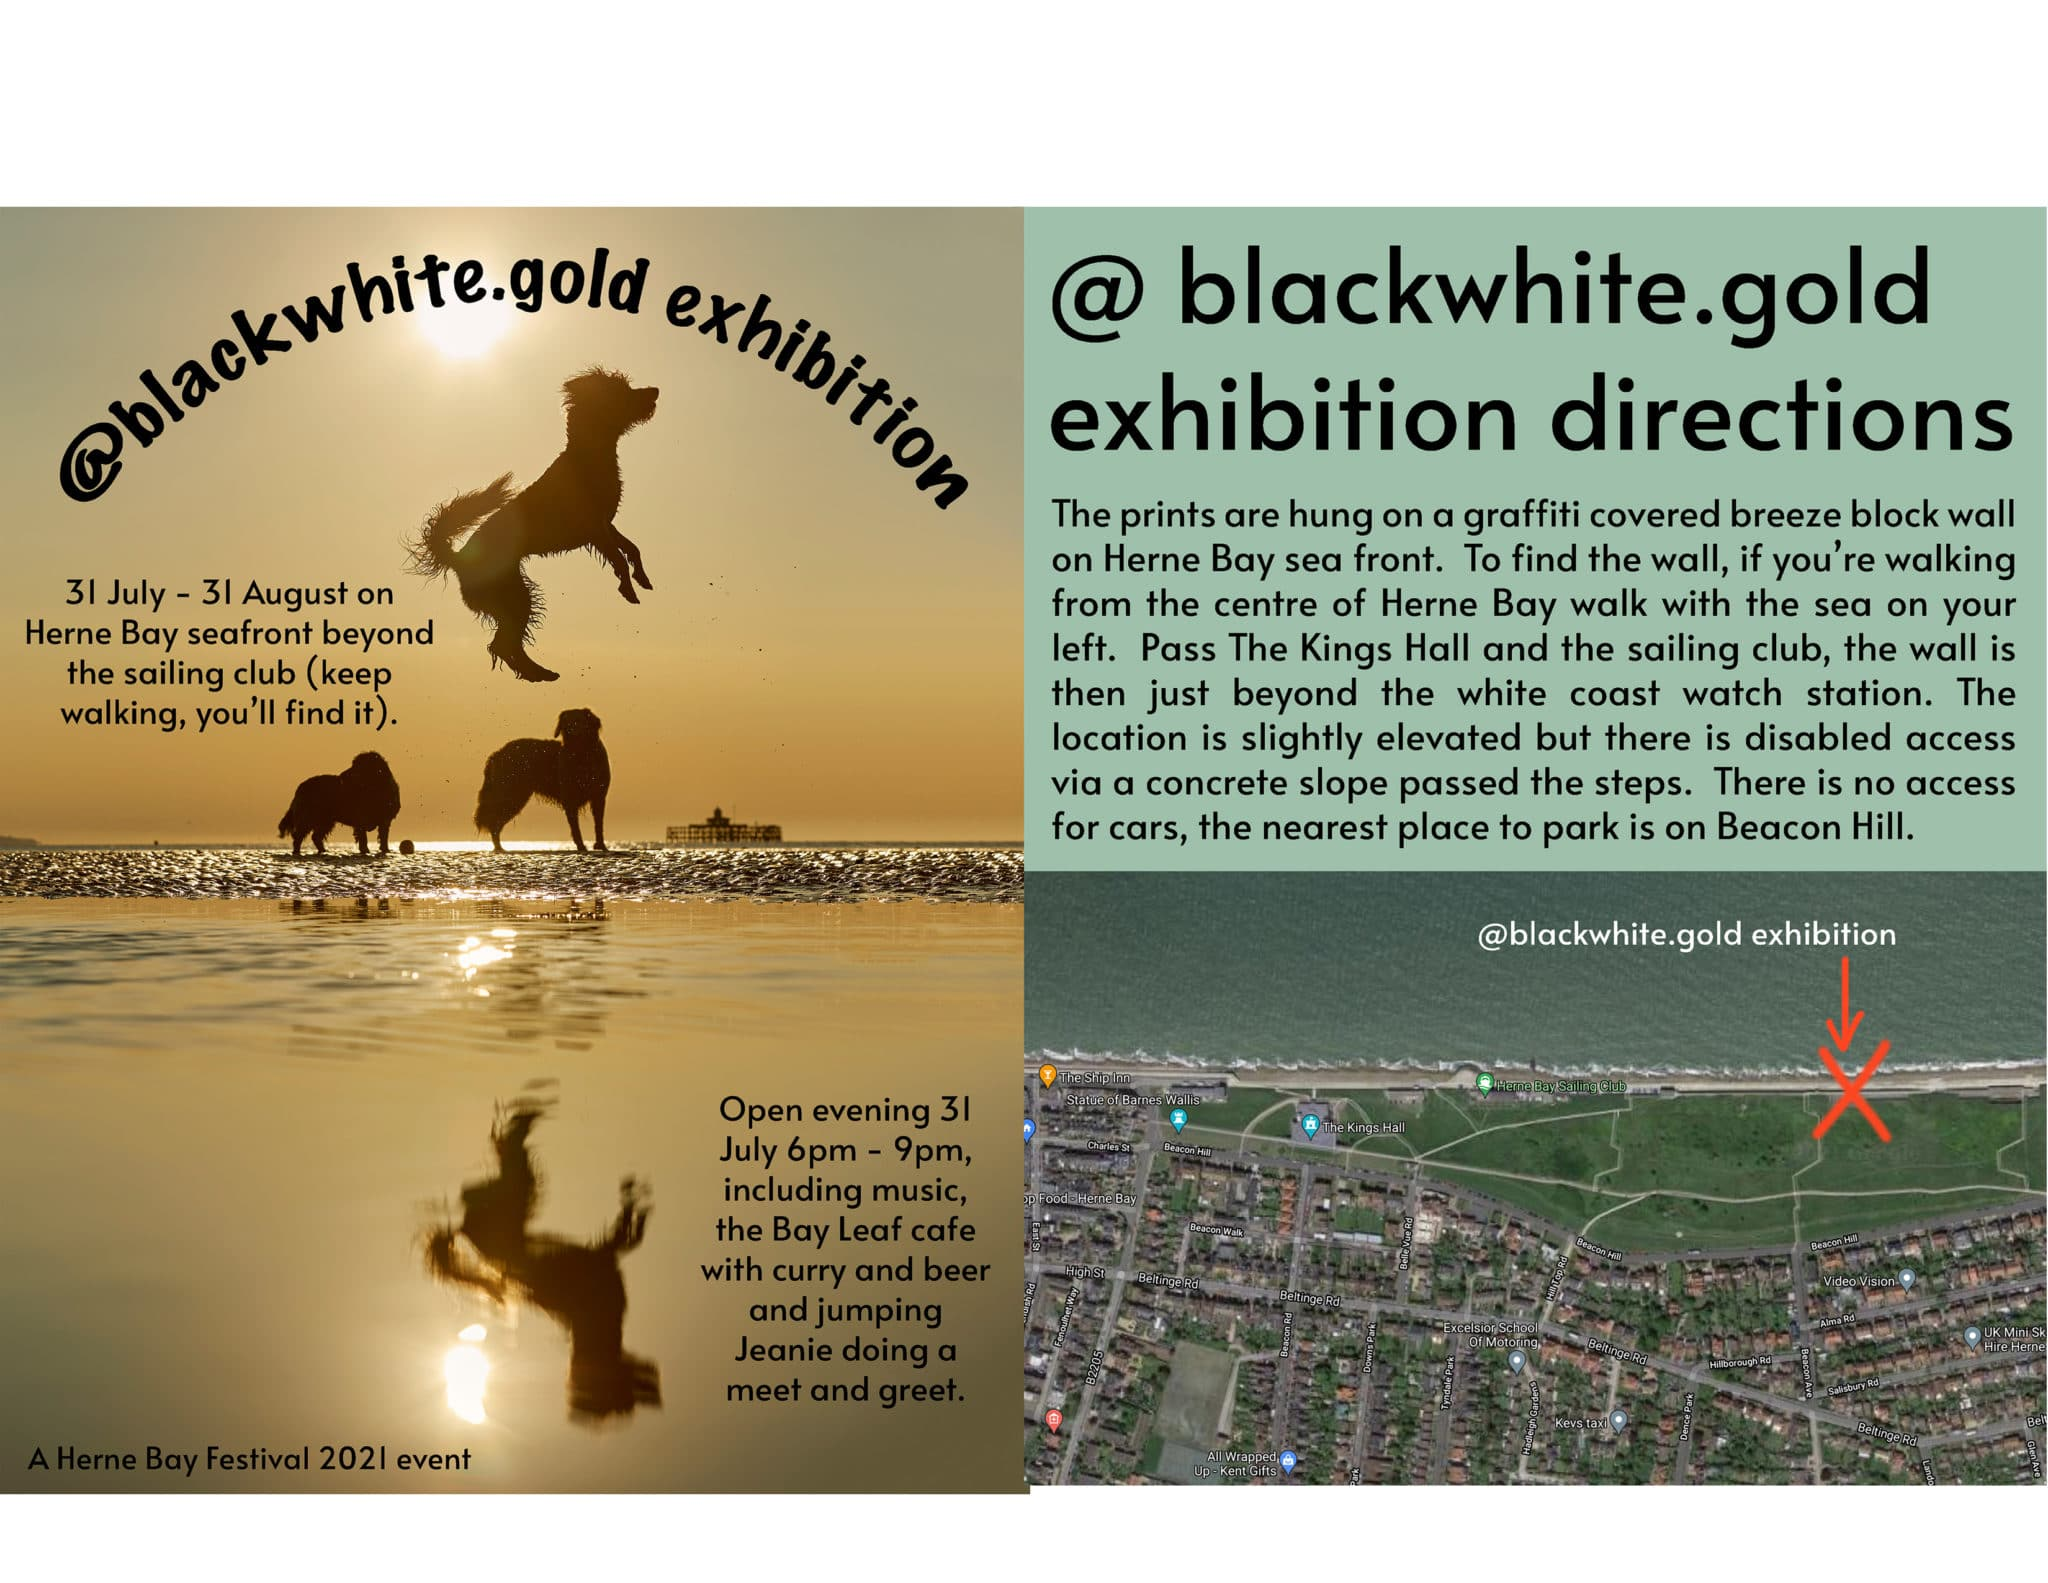 Black white gold exhibition by Liz Gregg